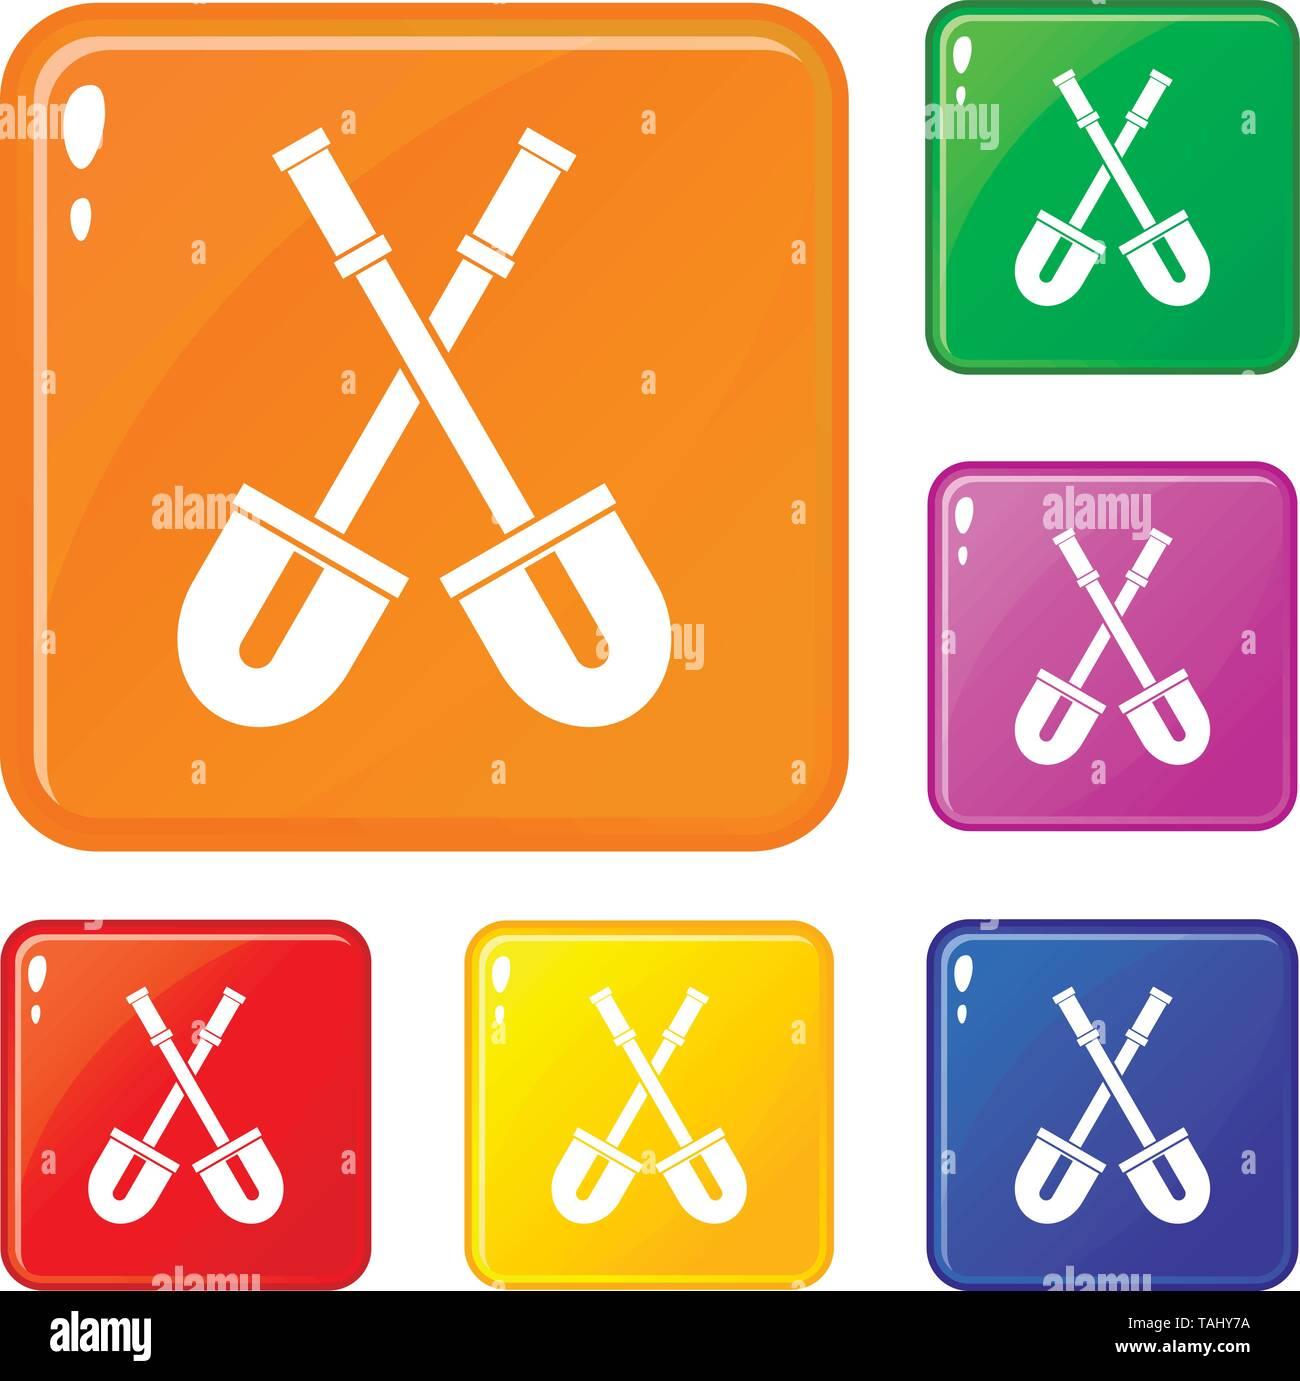 Shovels icons set vector color - Stock Image